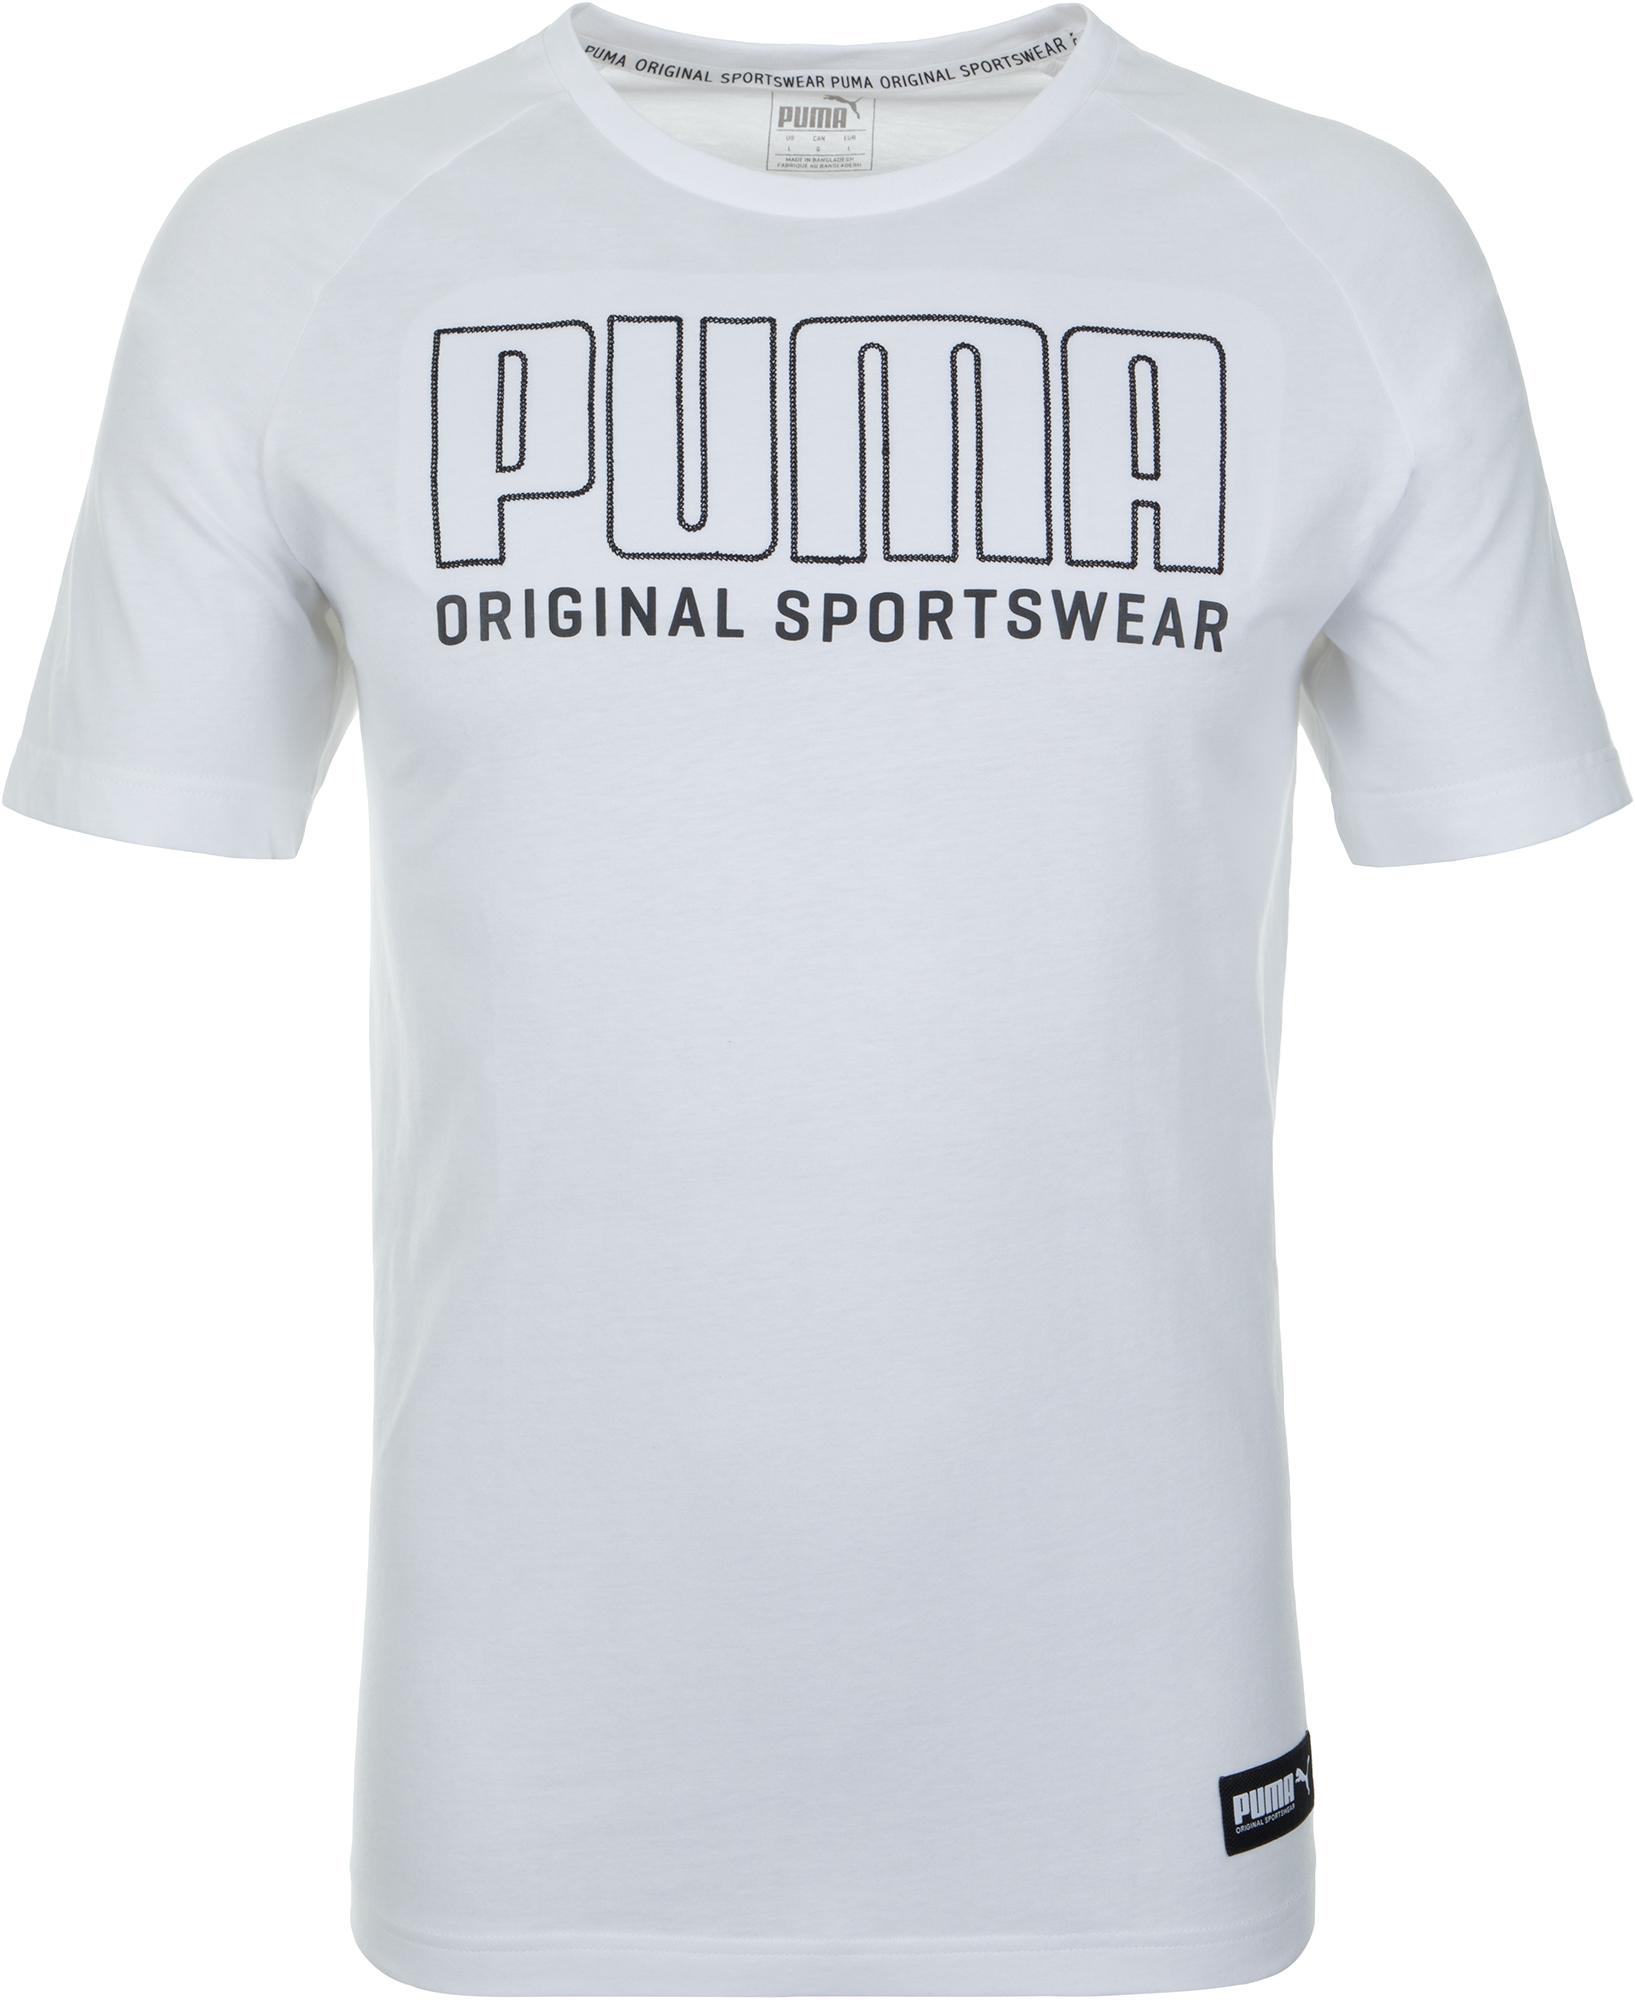 Puma Футболка мужская Puma Athletics, размер 50-52